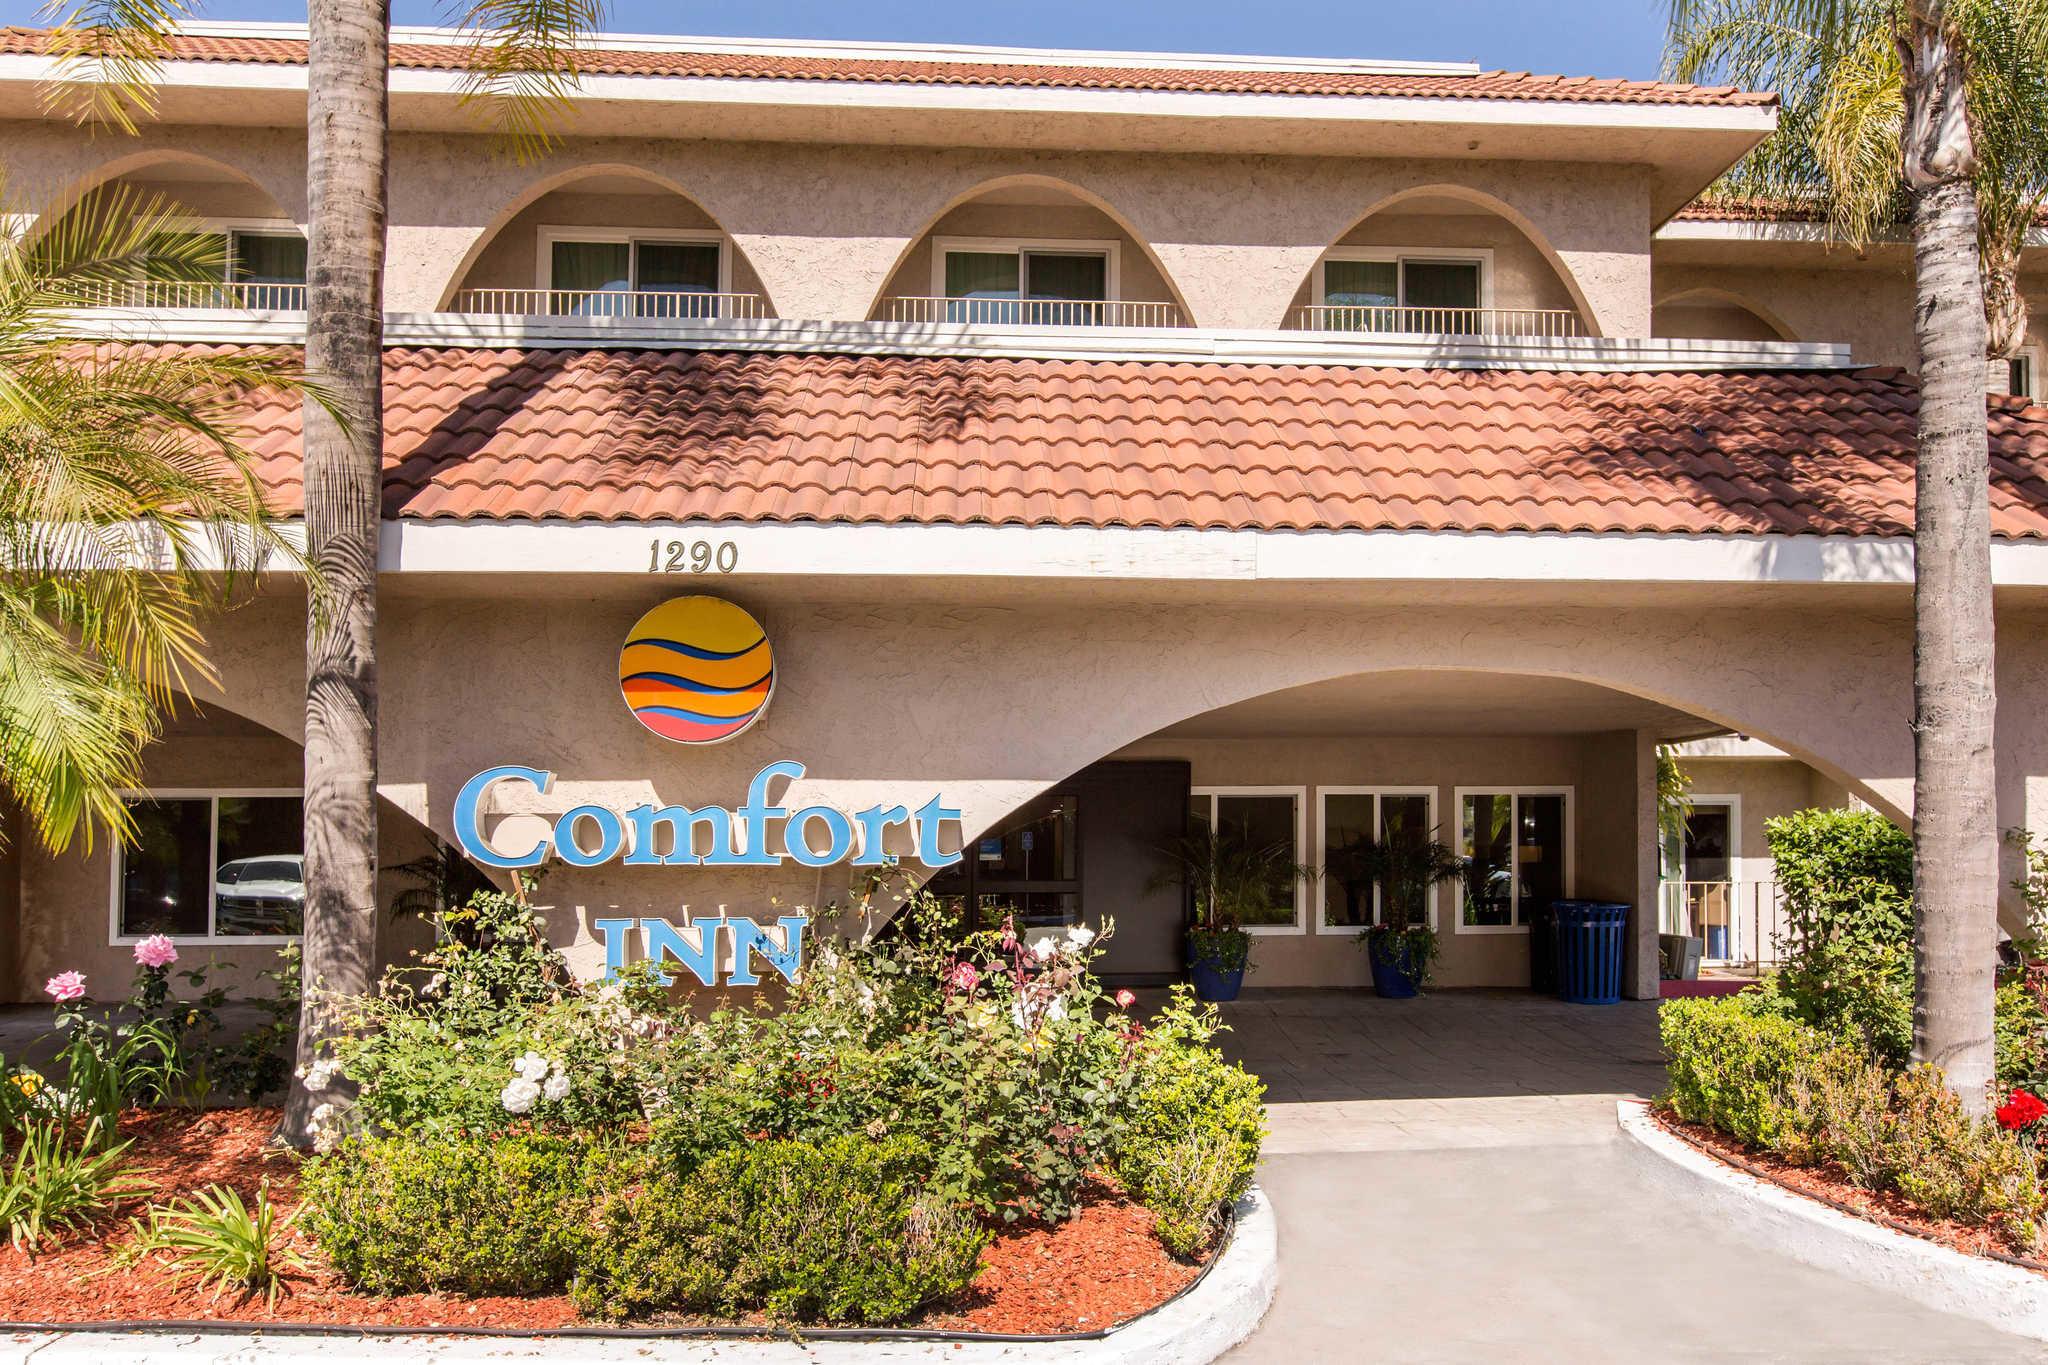 Comfort Inn Escondido San Diego North County image 2